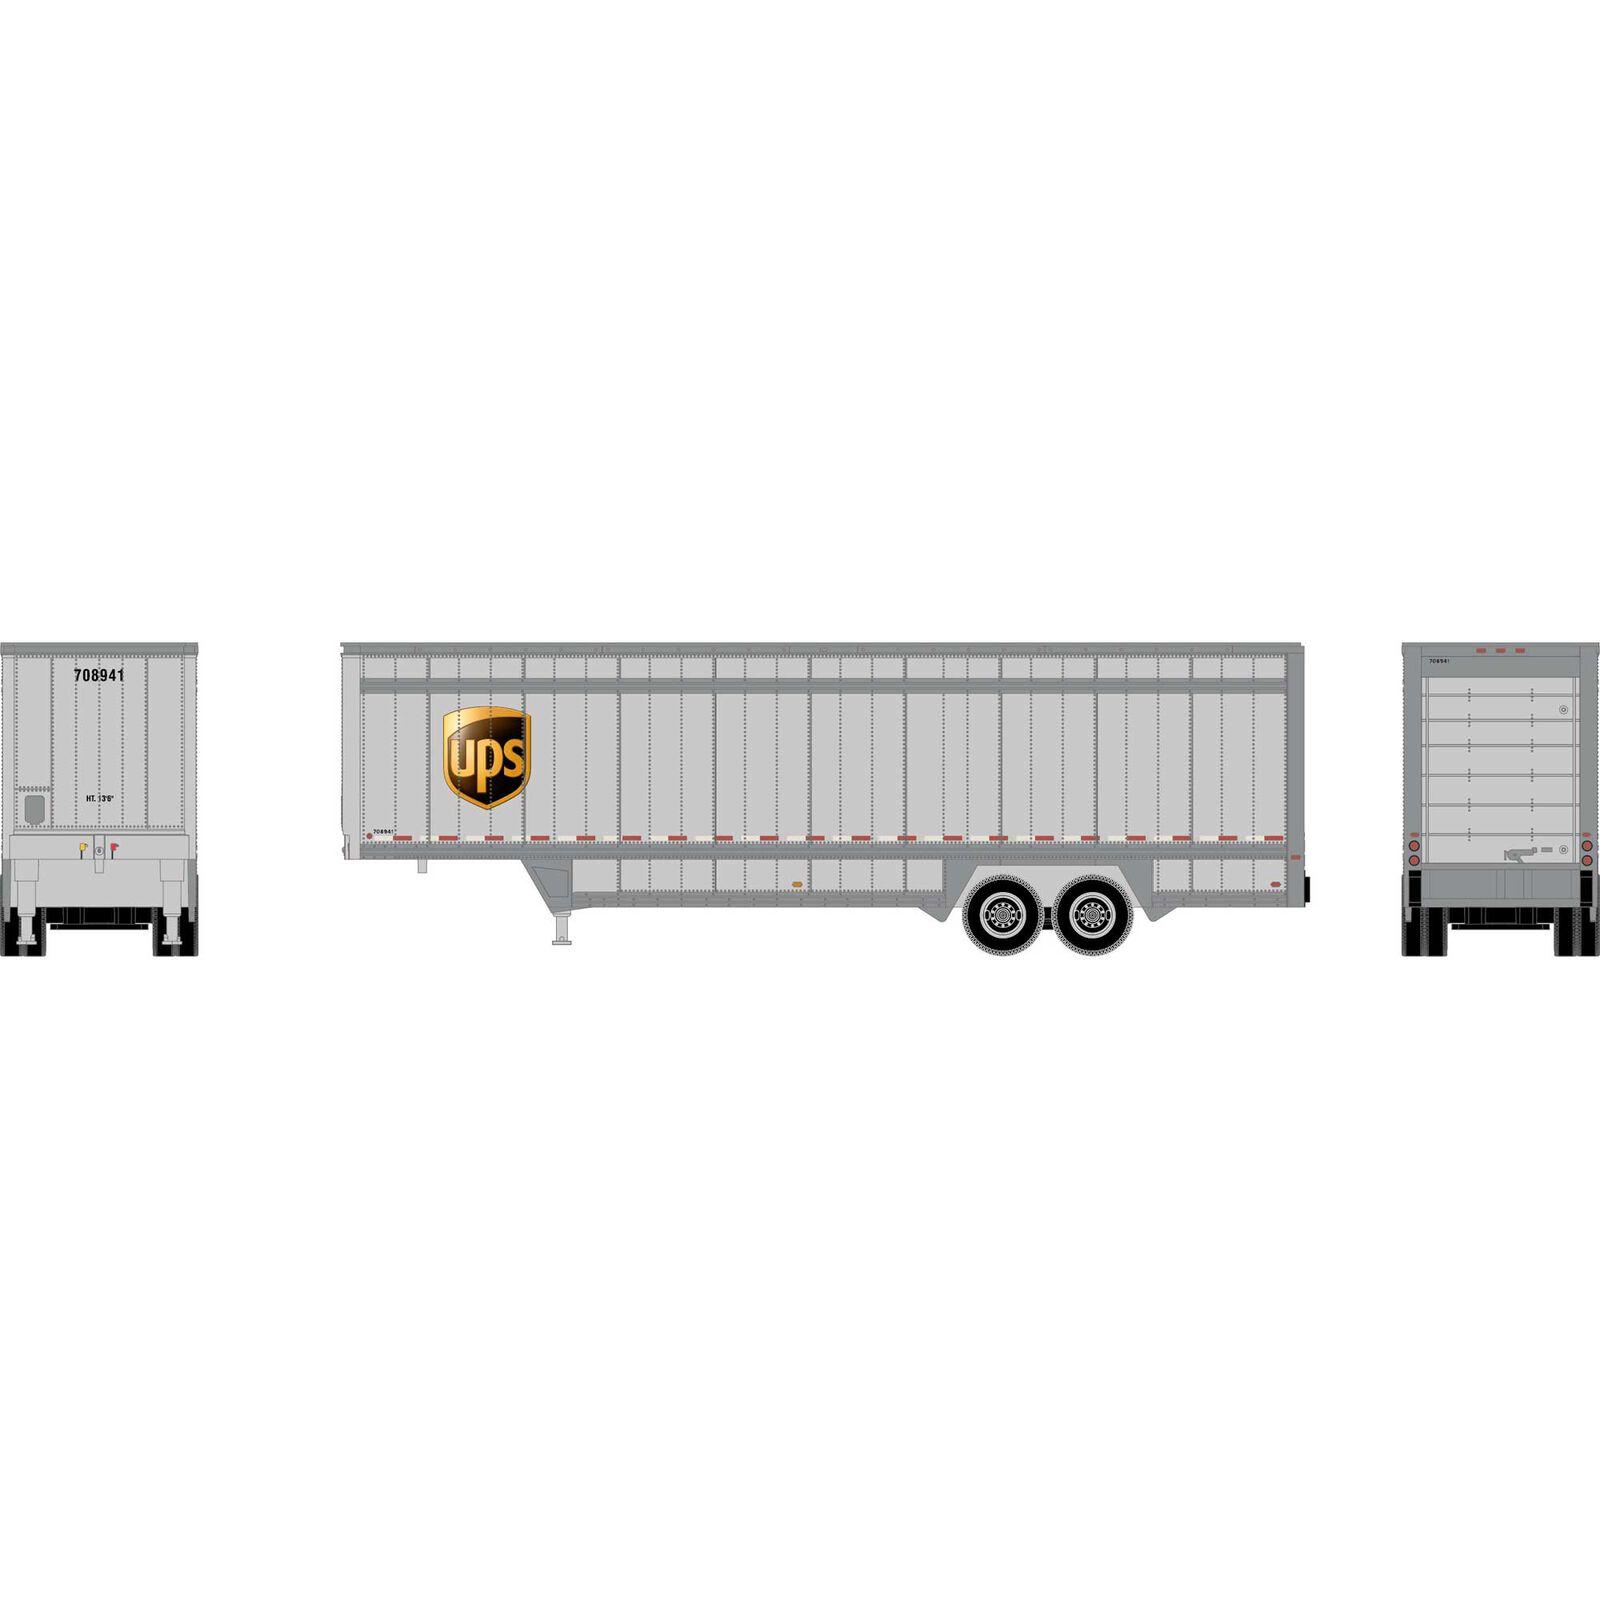 HO 40' Drop Sill Parcel Trailer, UPS/Logo #708941